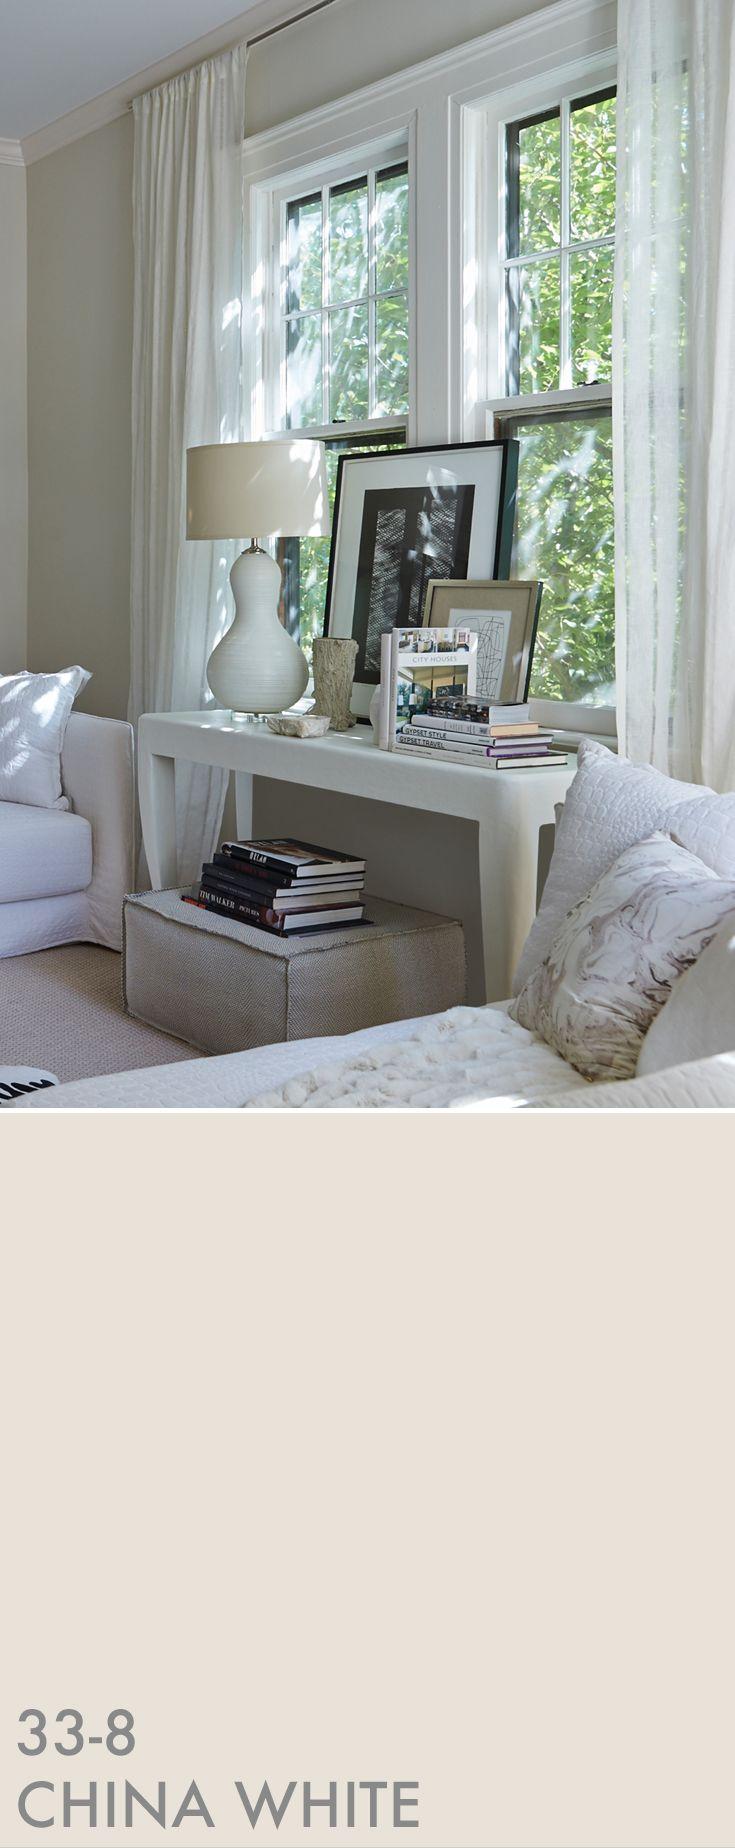 162 best pratt lambert paint colors images on pinterest. Black Bedroom Furniture Sets. Home Design Ideas